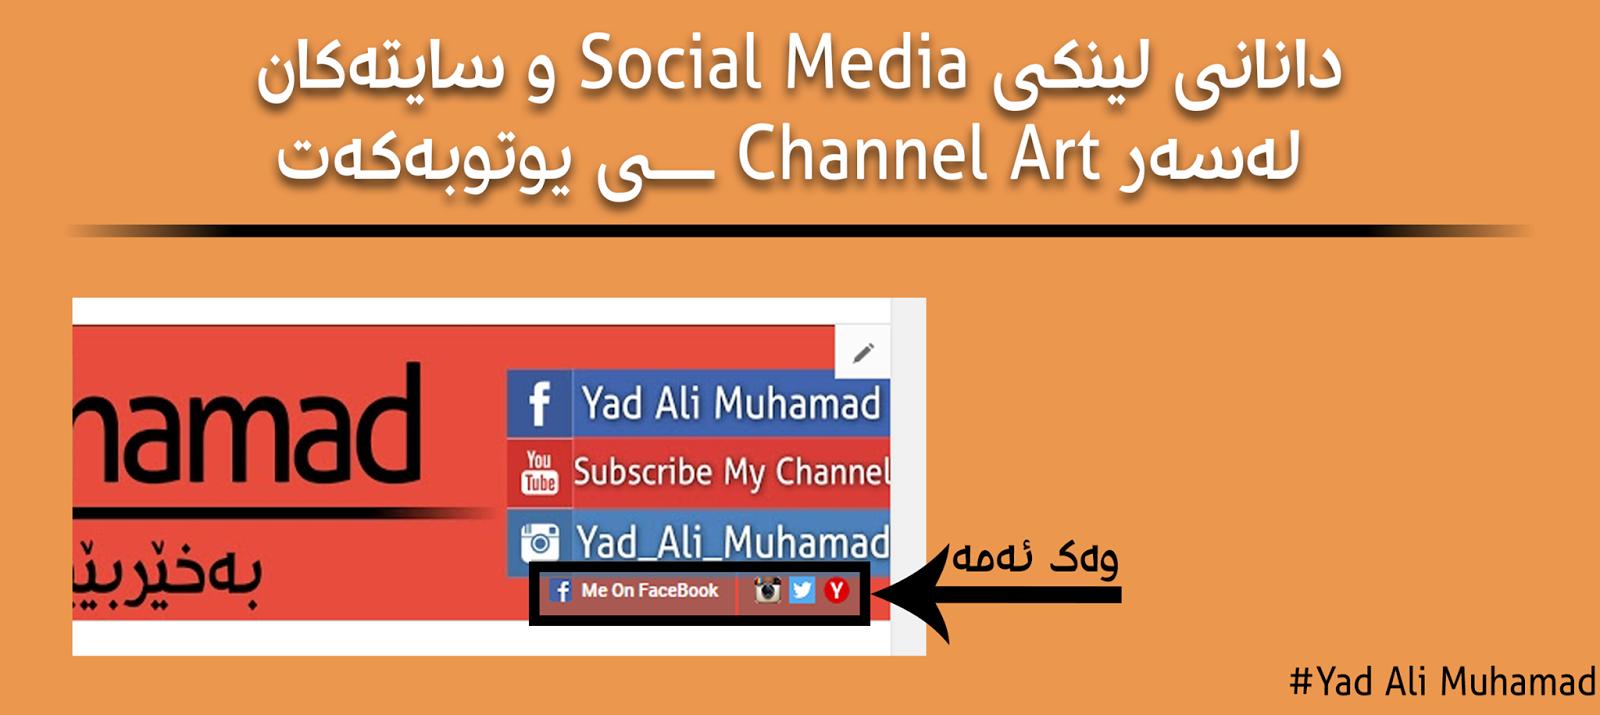 دانانی لینكی (فهیسبووك،ئینستاگرام،سایتهكان) لهسهر Channel Artــی یوتوب